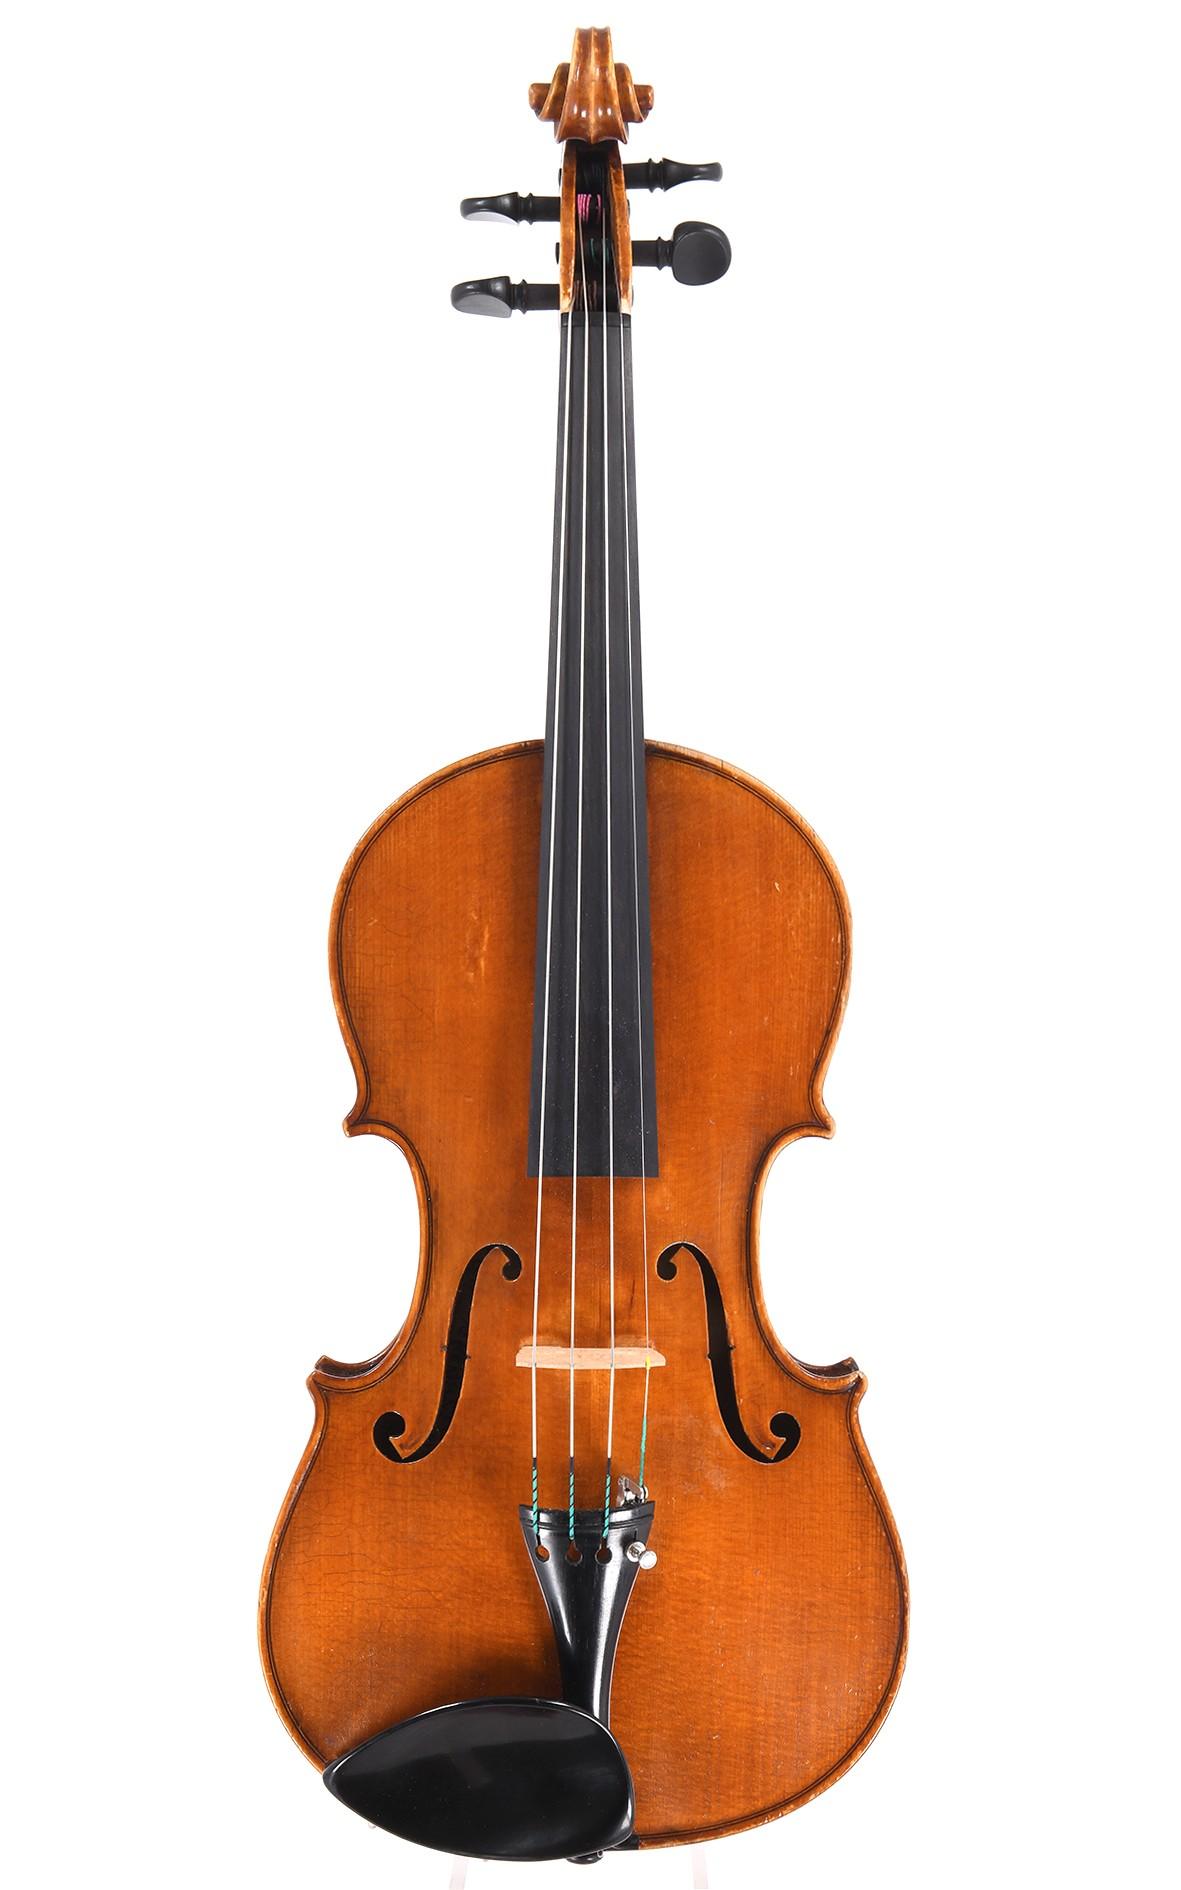 Violon italien de l'Officina Claudio Monteverde, Cremona